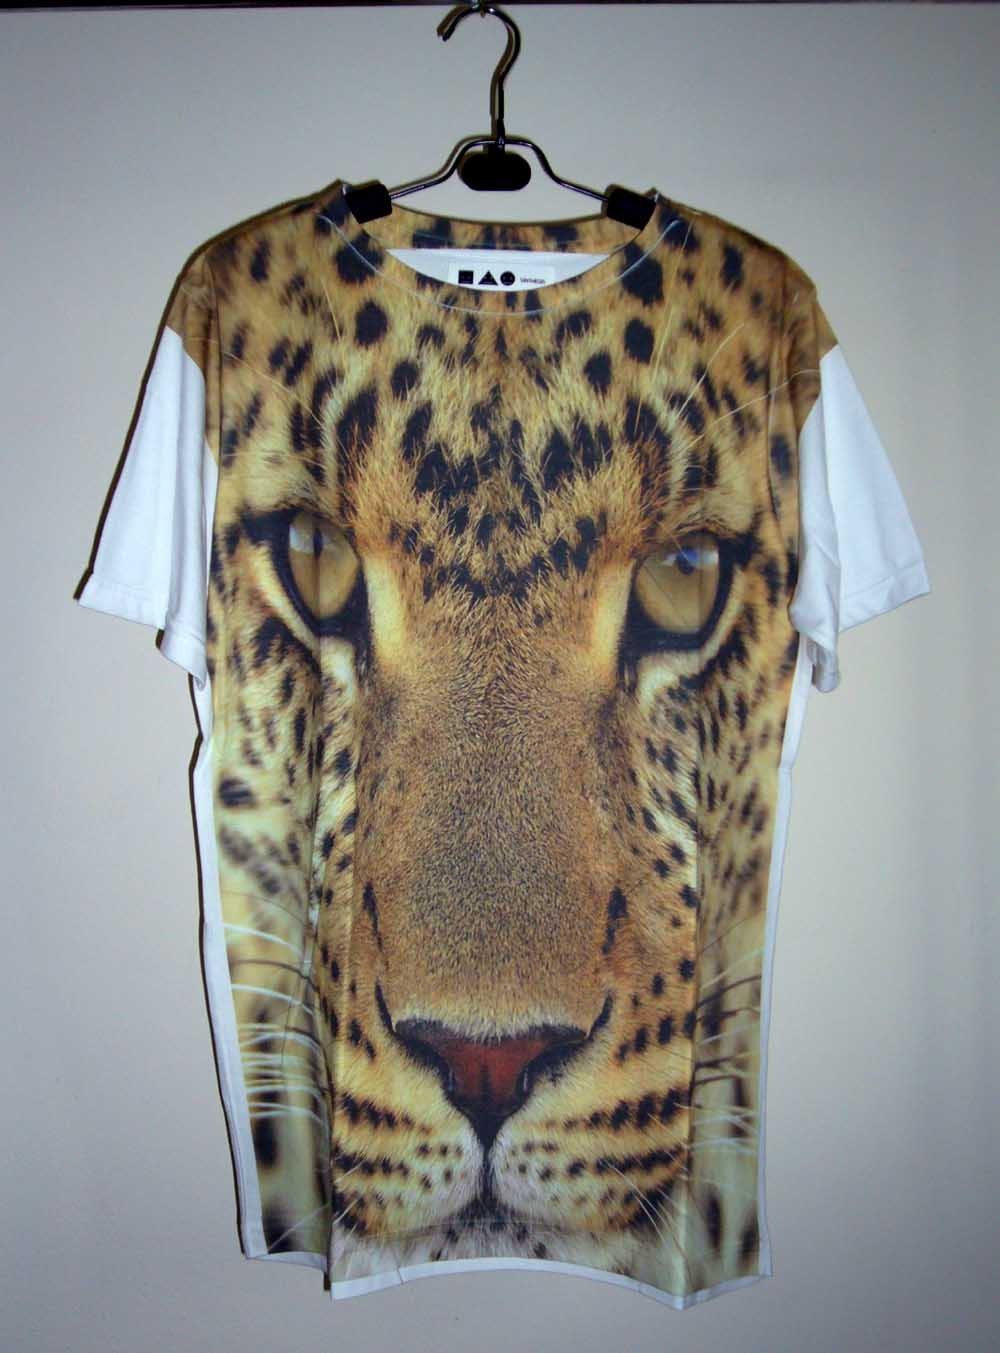 leopard shirt animal shirt tiger t shirt cheetah shirt. Black Bedroom Furniture Sets. Home Design Ideas